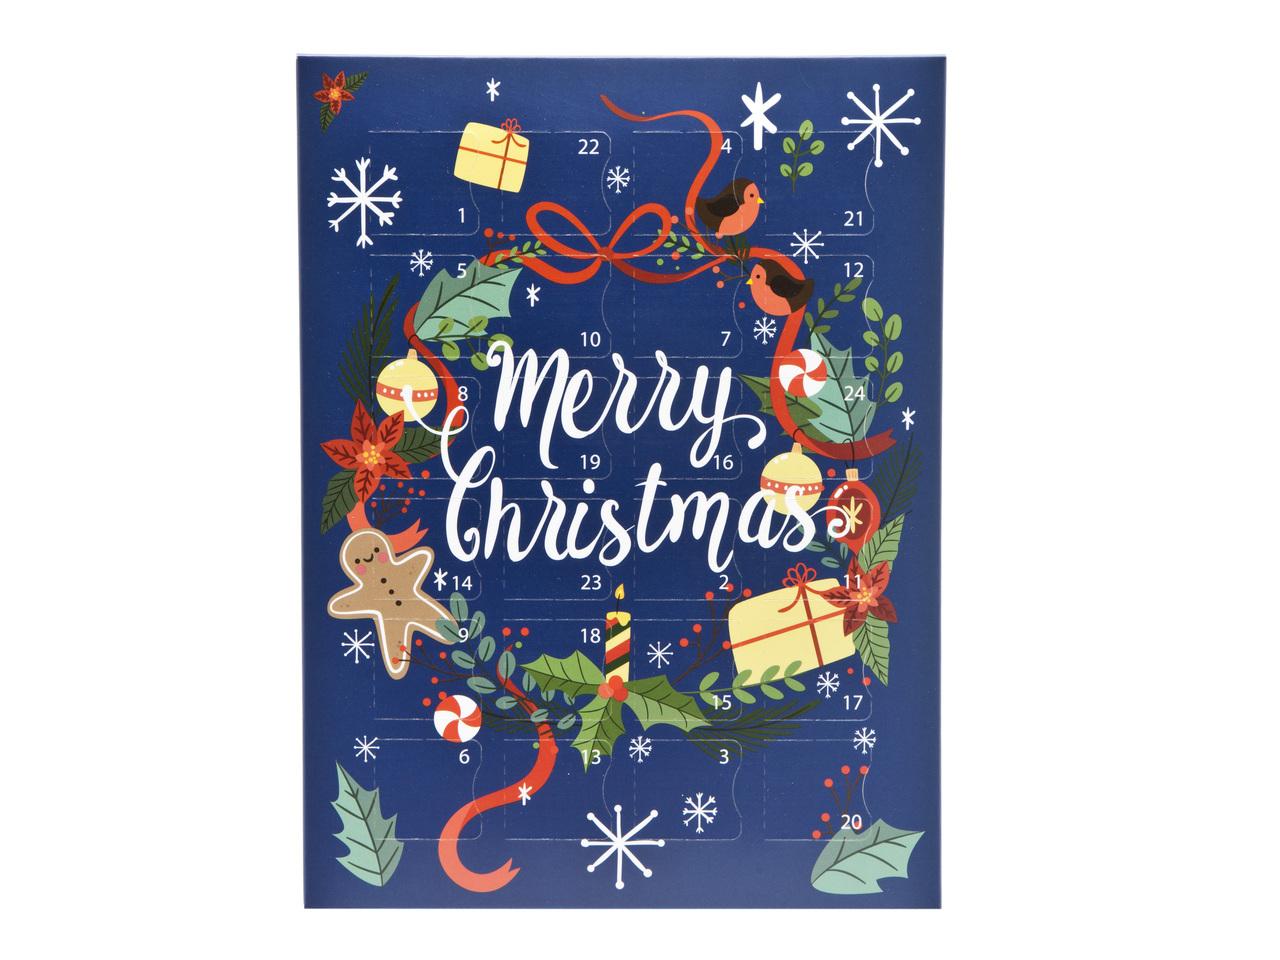 Wreath Premium Deluxe Advent Calendar sized - Fill it Yourself Advent Calendar Box Ideal for the festive season